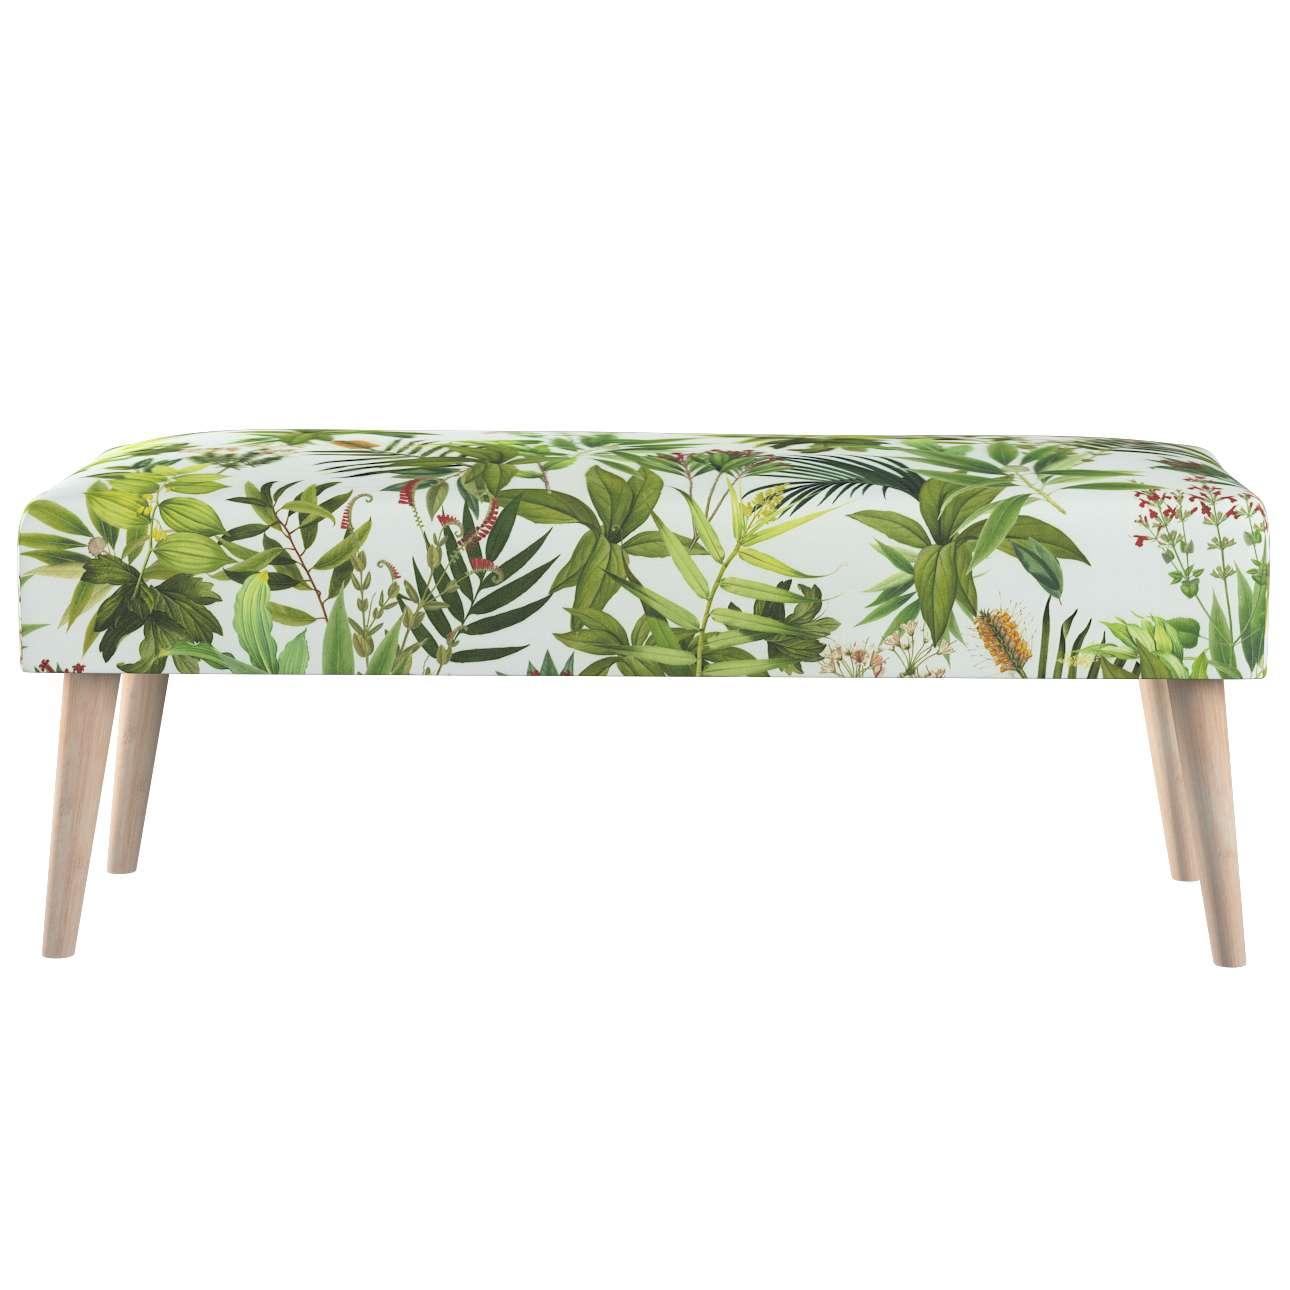 Ławka natural w kolekcji Tropical Island, tkanina: 143-69